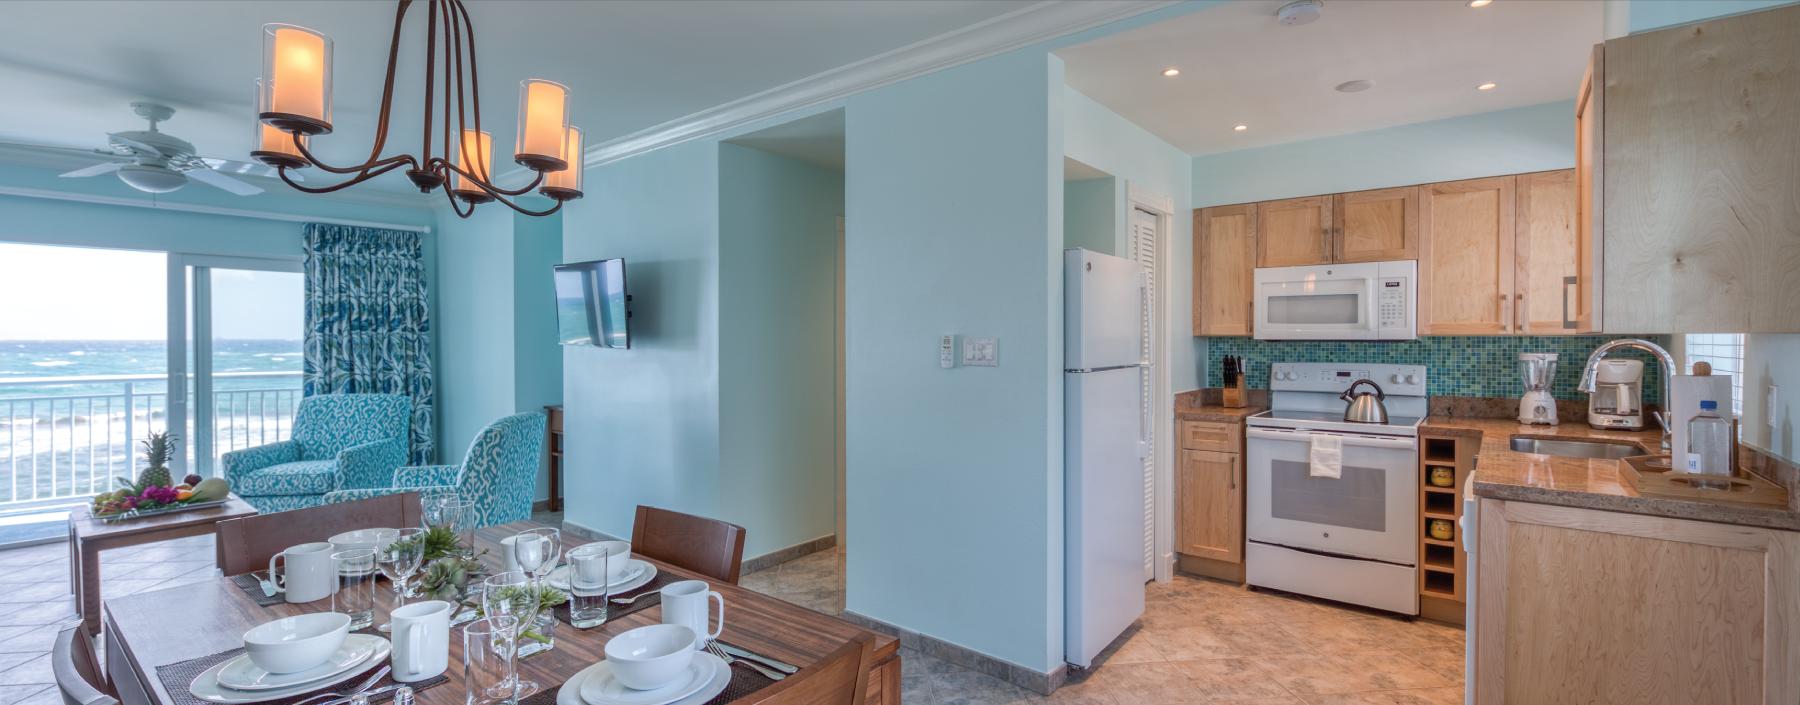 Oyster Bay Suites